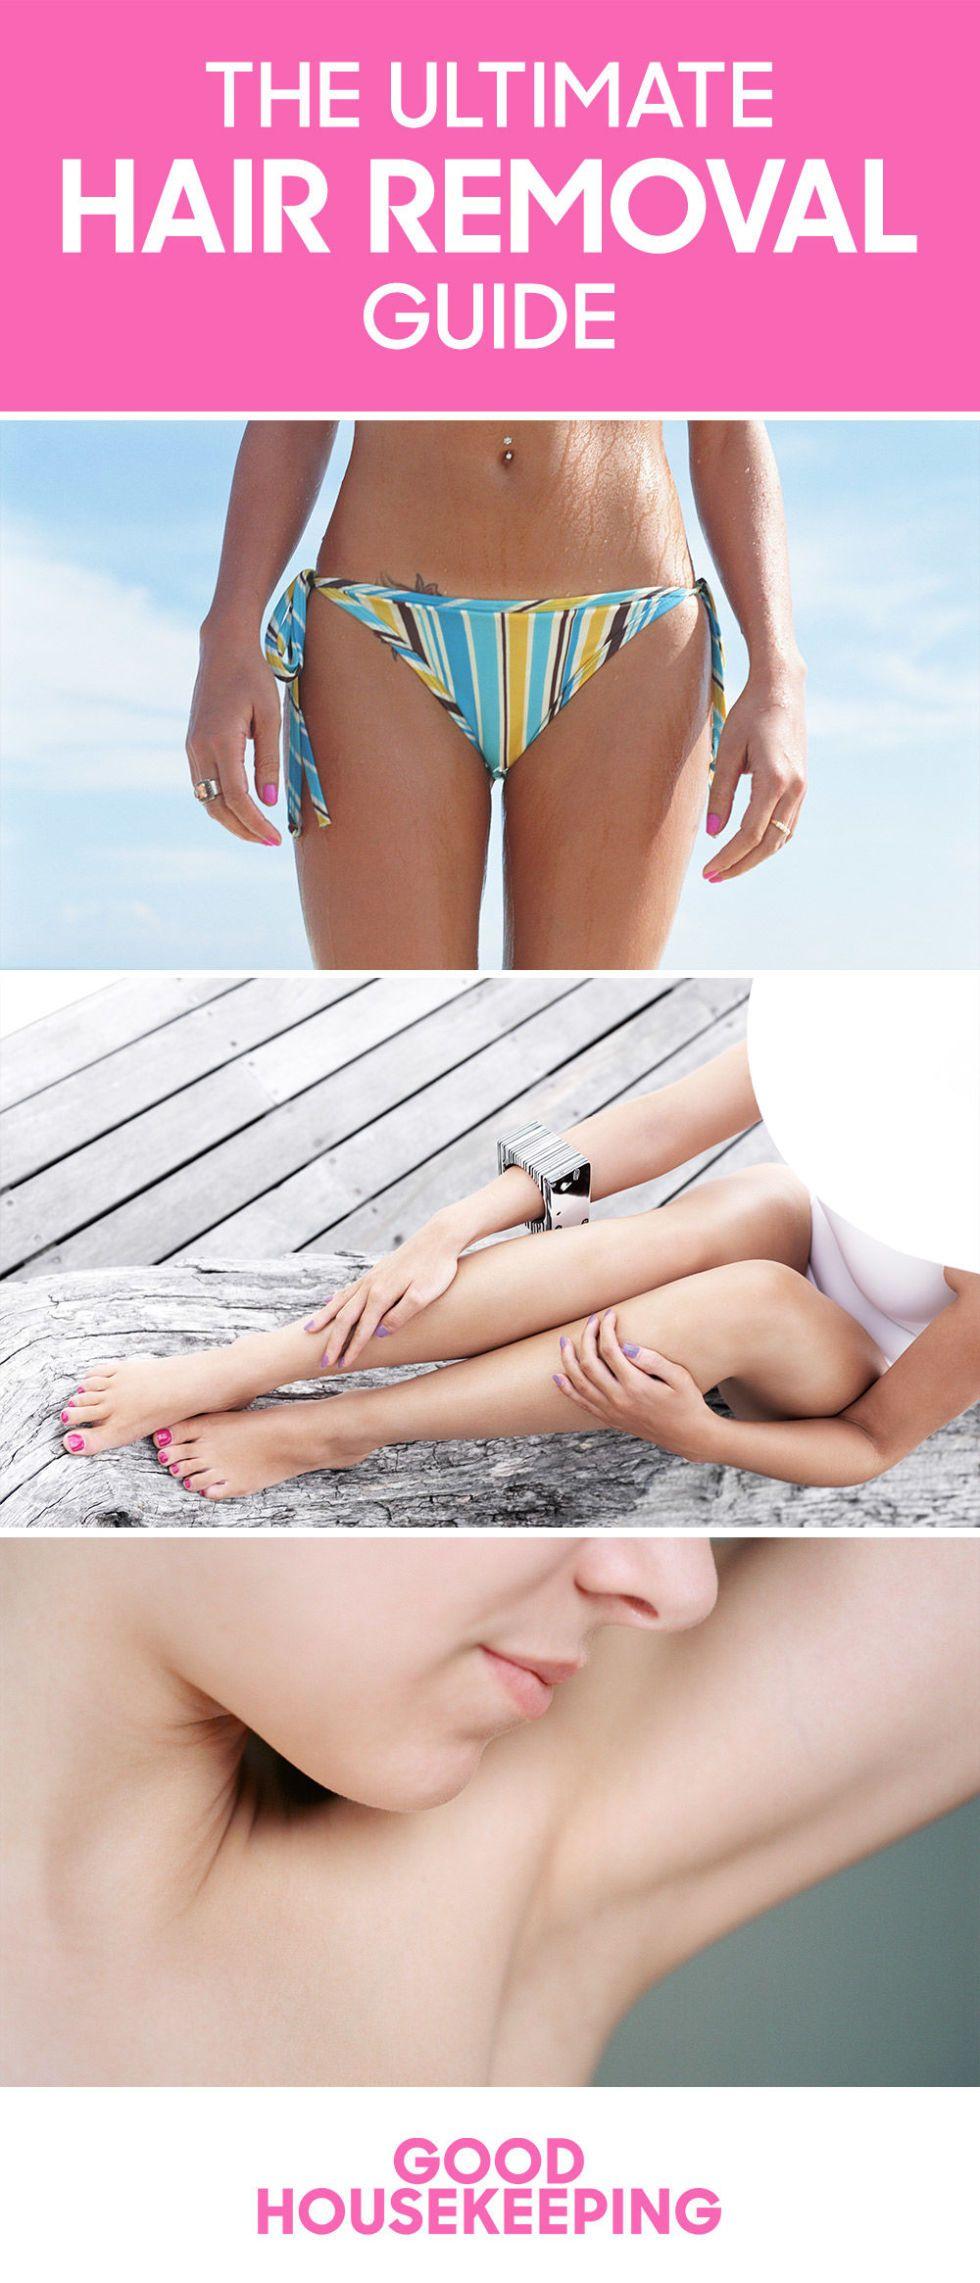 Portuguese girls naked on beach